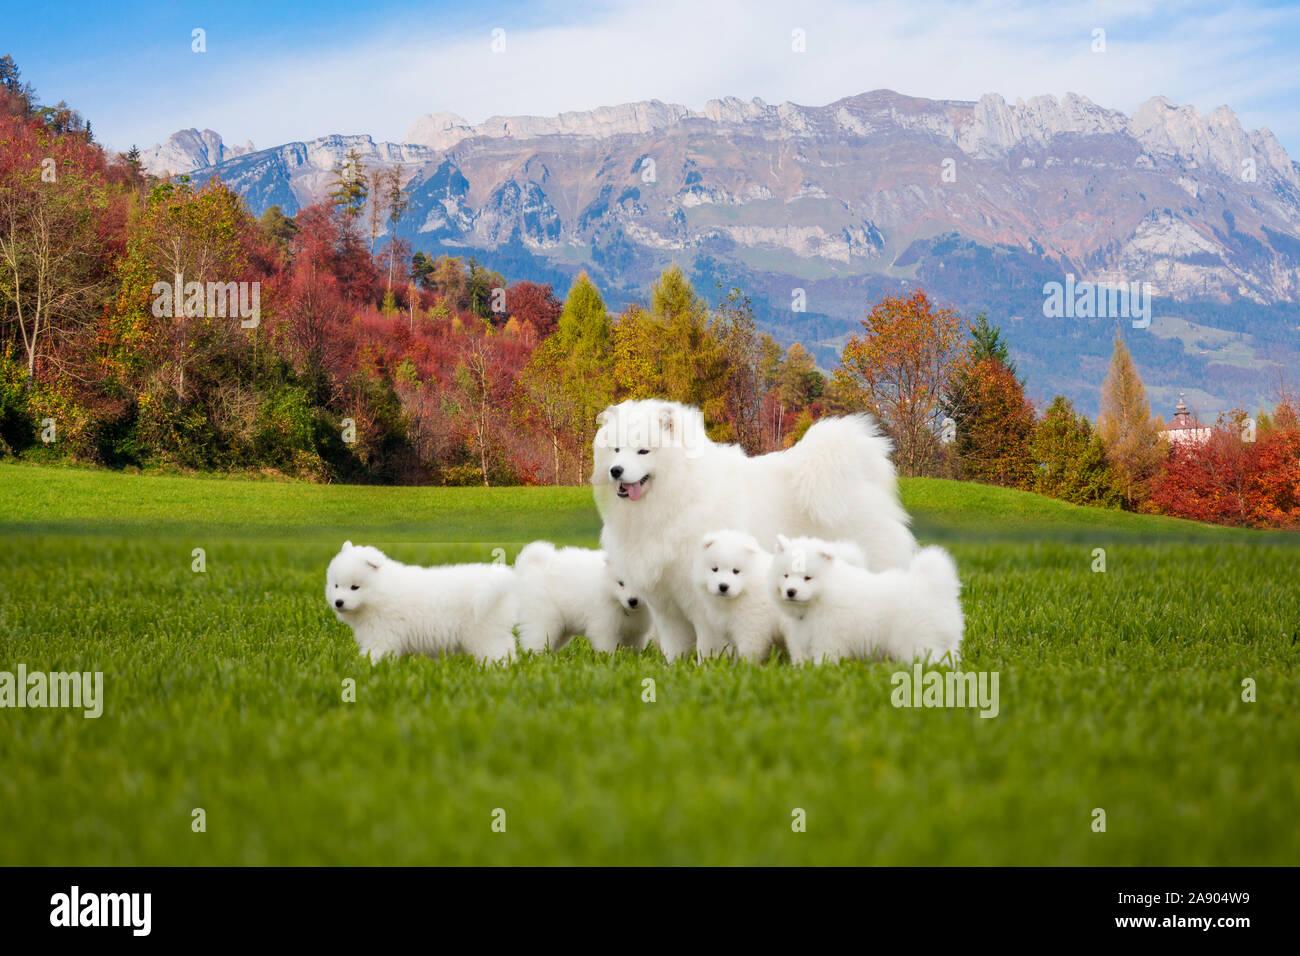 Samoyed Dog With Puppies Portrait Of Beautiful Dogs On Beautiful Landscape Stock Photo Alamy